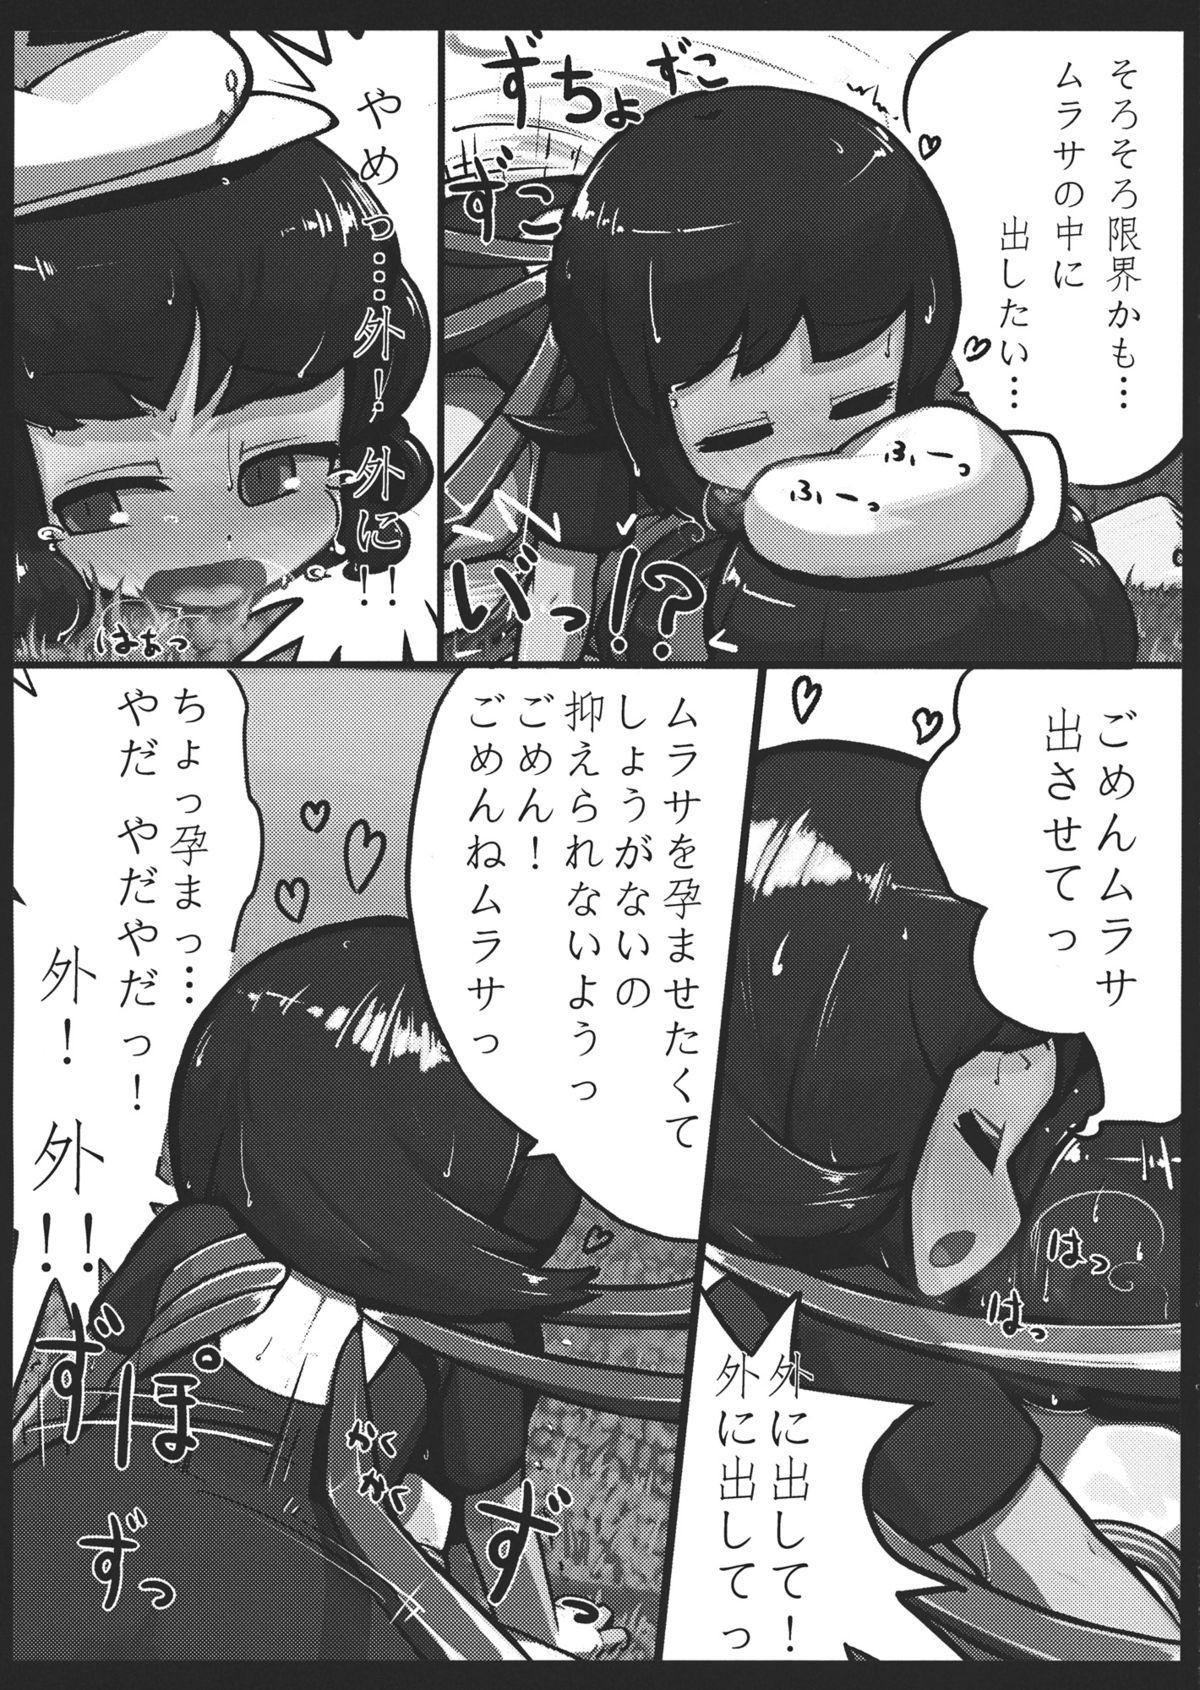 Nue x Murasa Shunga 18